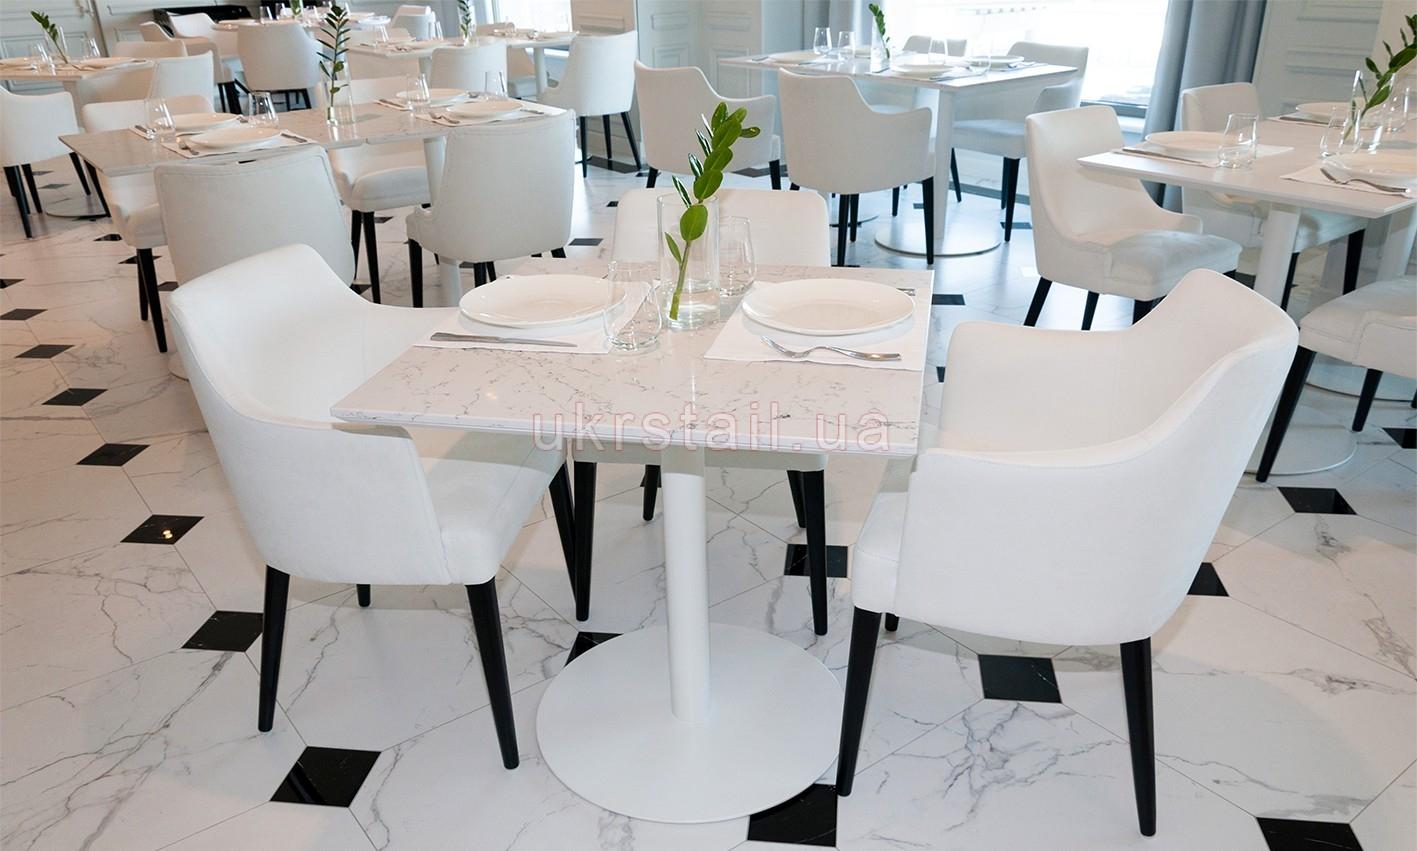 Стол Vogue Cafe Kiev в гостинице Fairmont 08